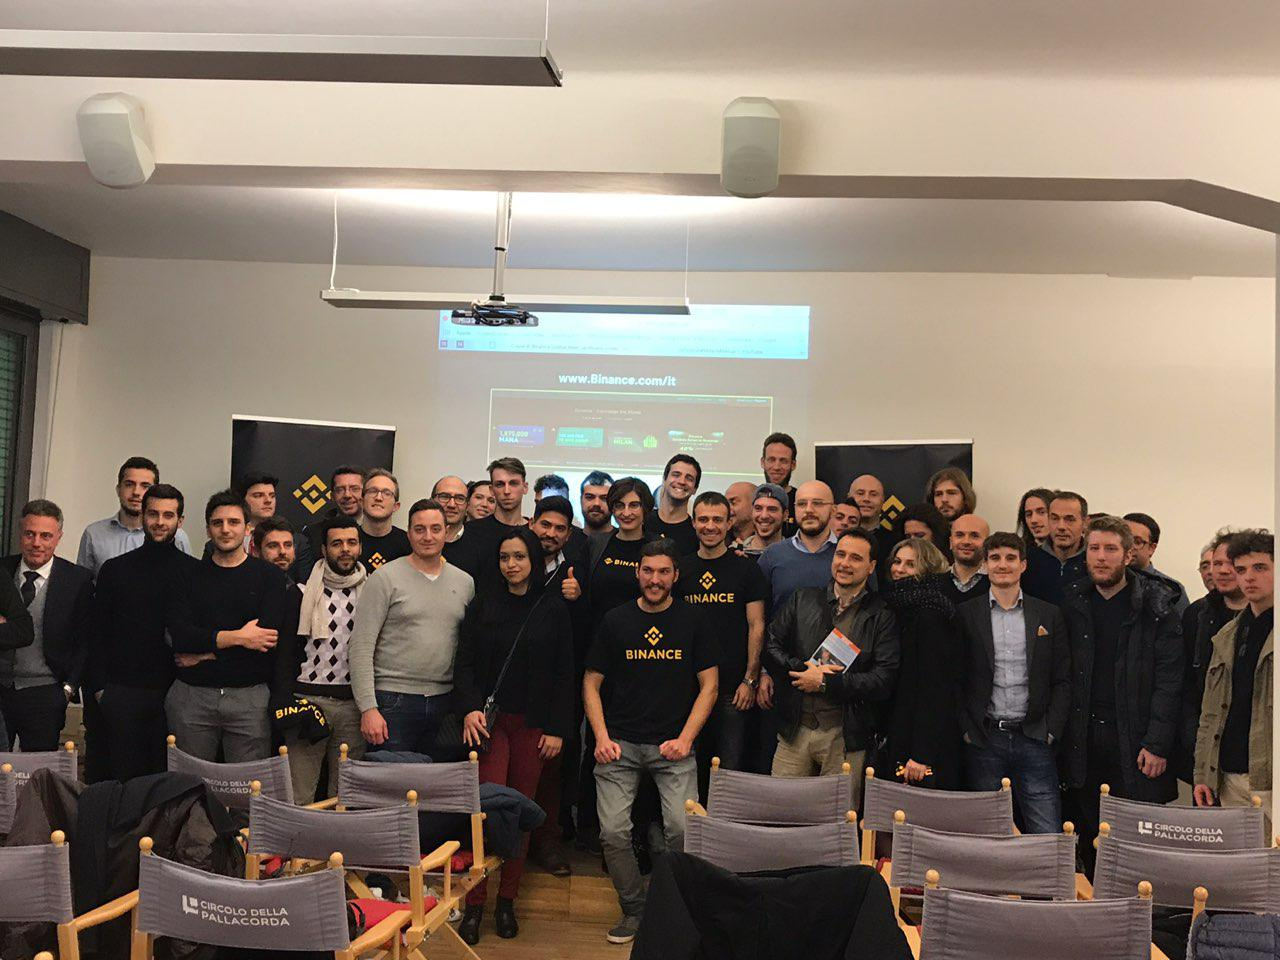 Binance Meetup Milan: future developments of the crypto exchange